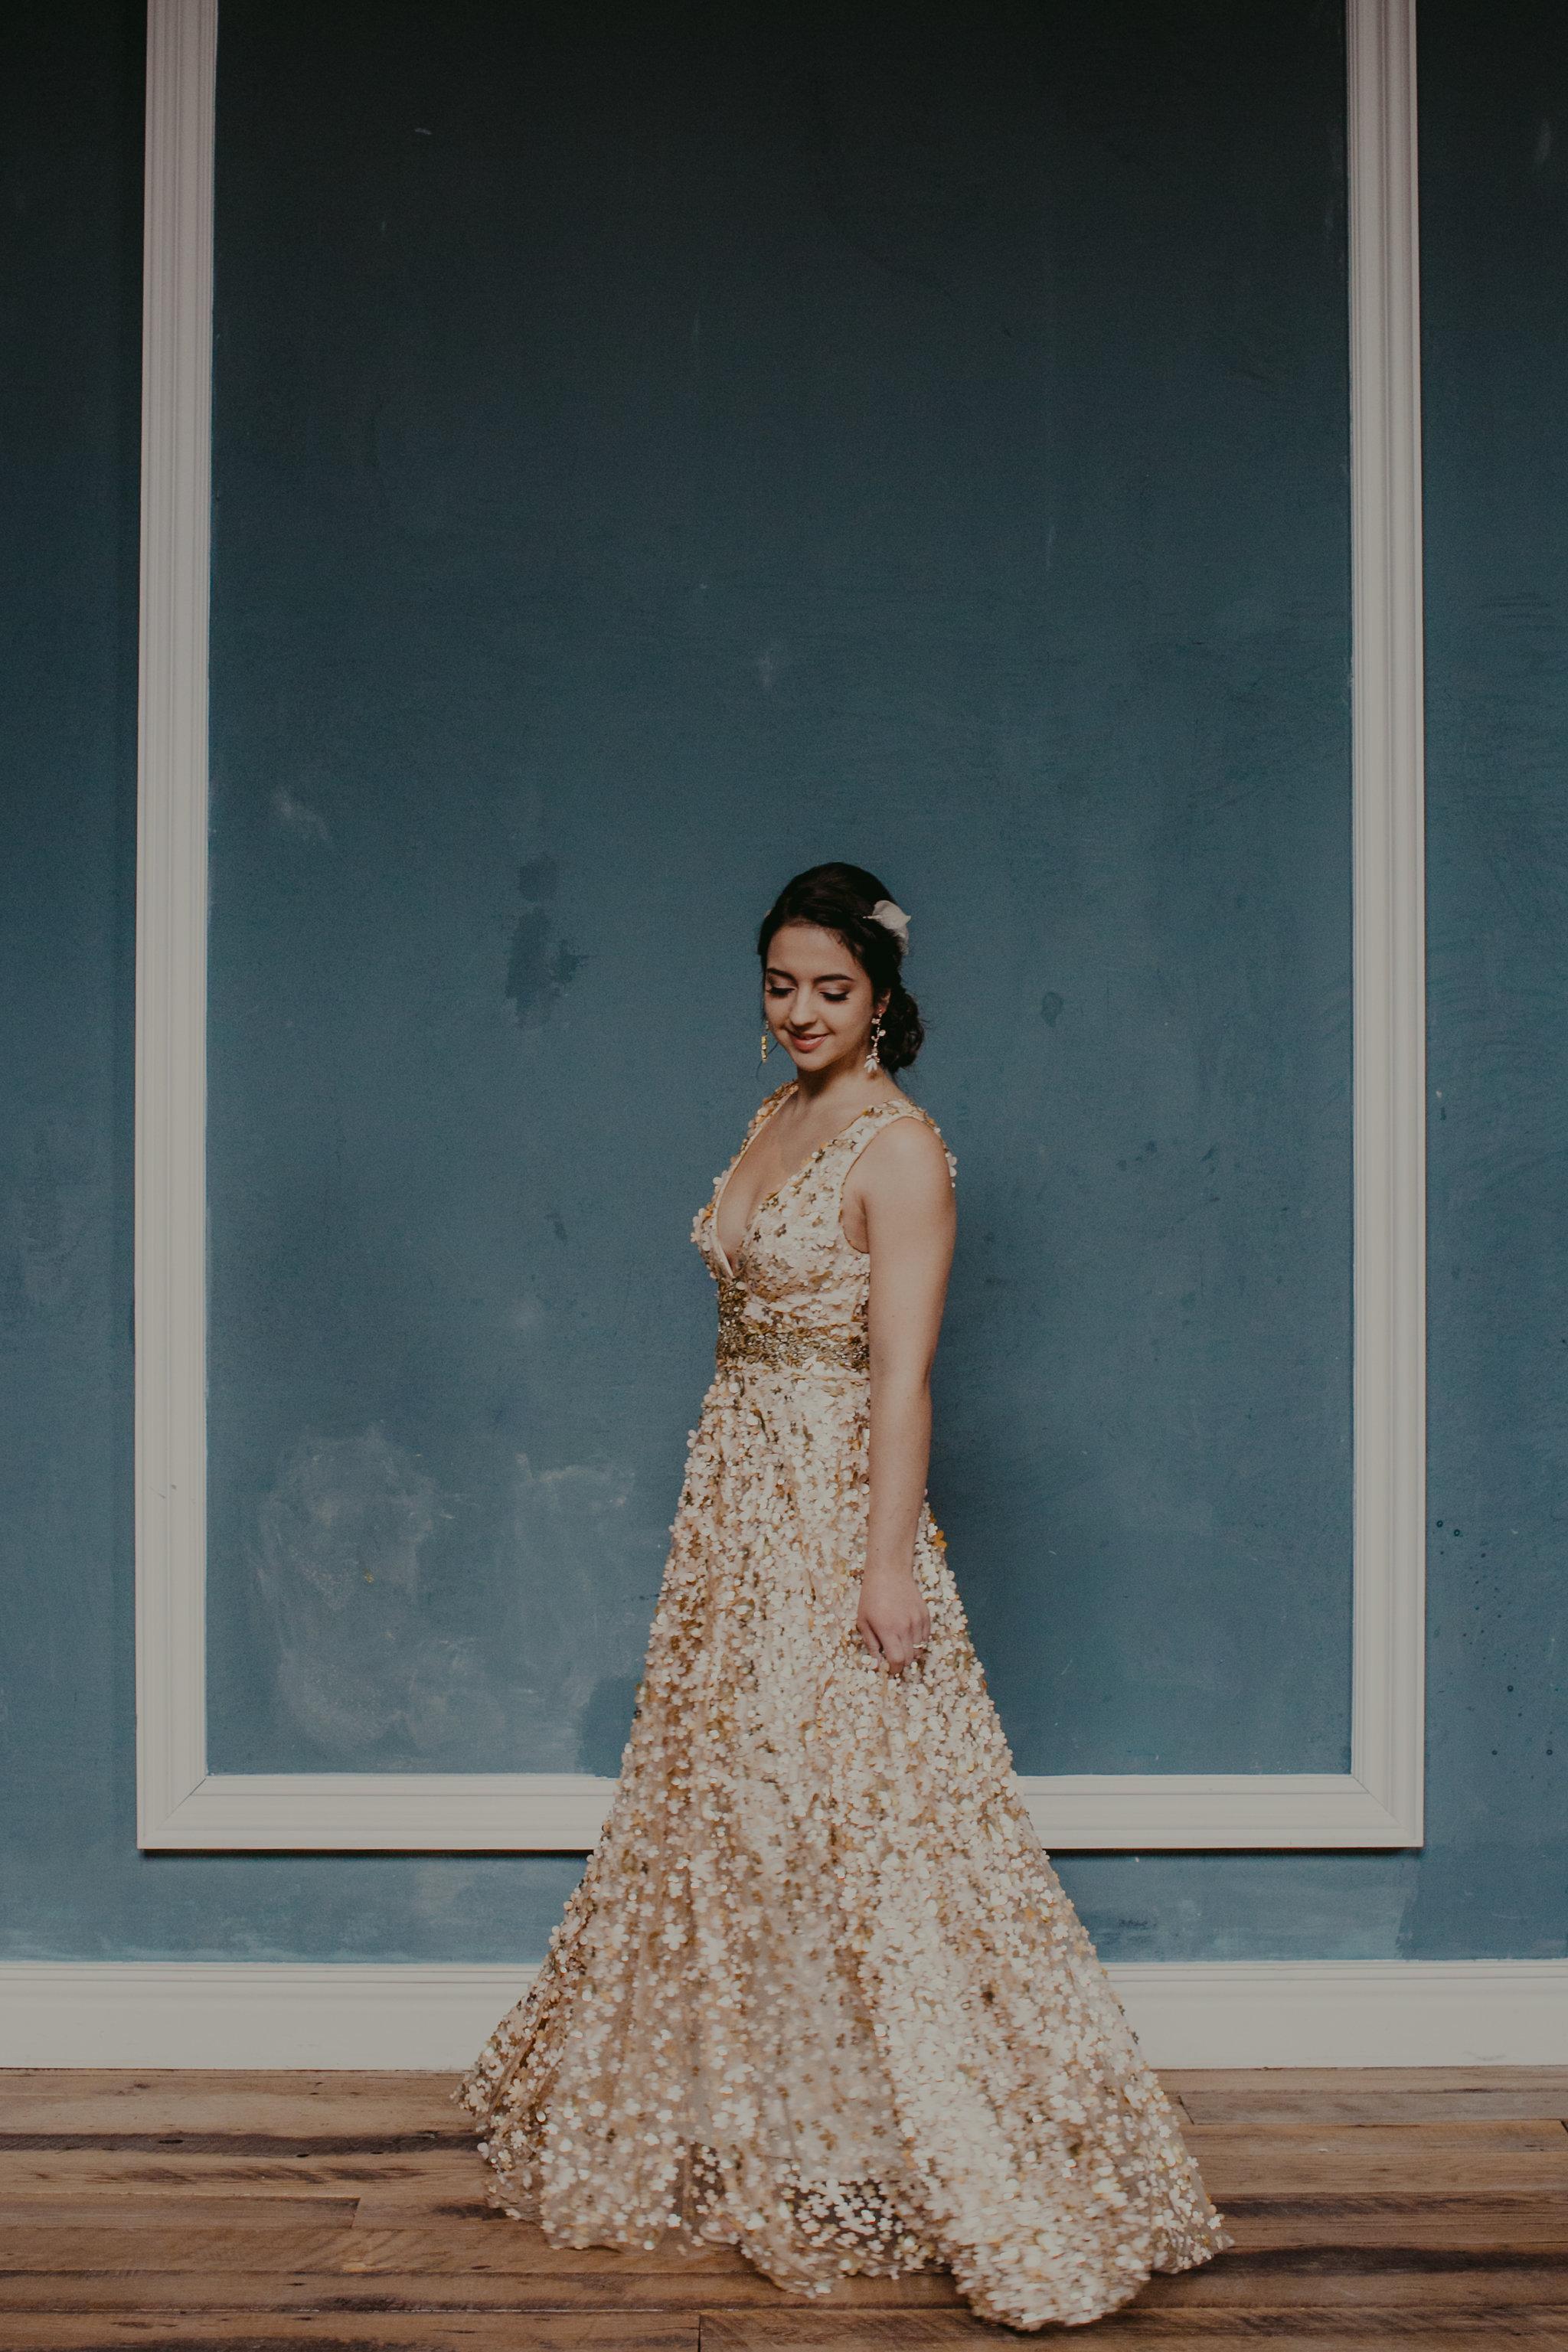 Williamsburg_Hotel_Wedding_Photographer_Chellise_Michael_Photography-124.jpg